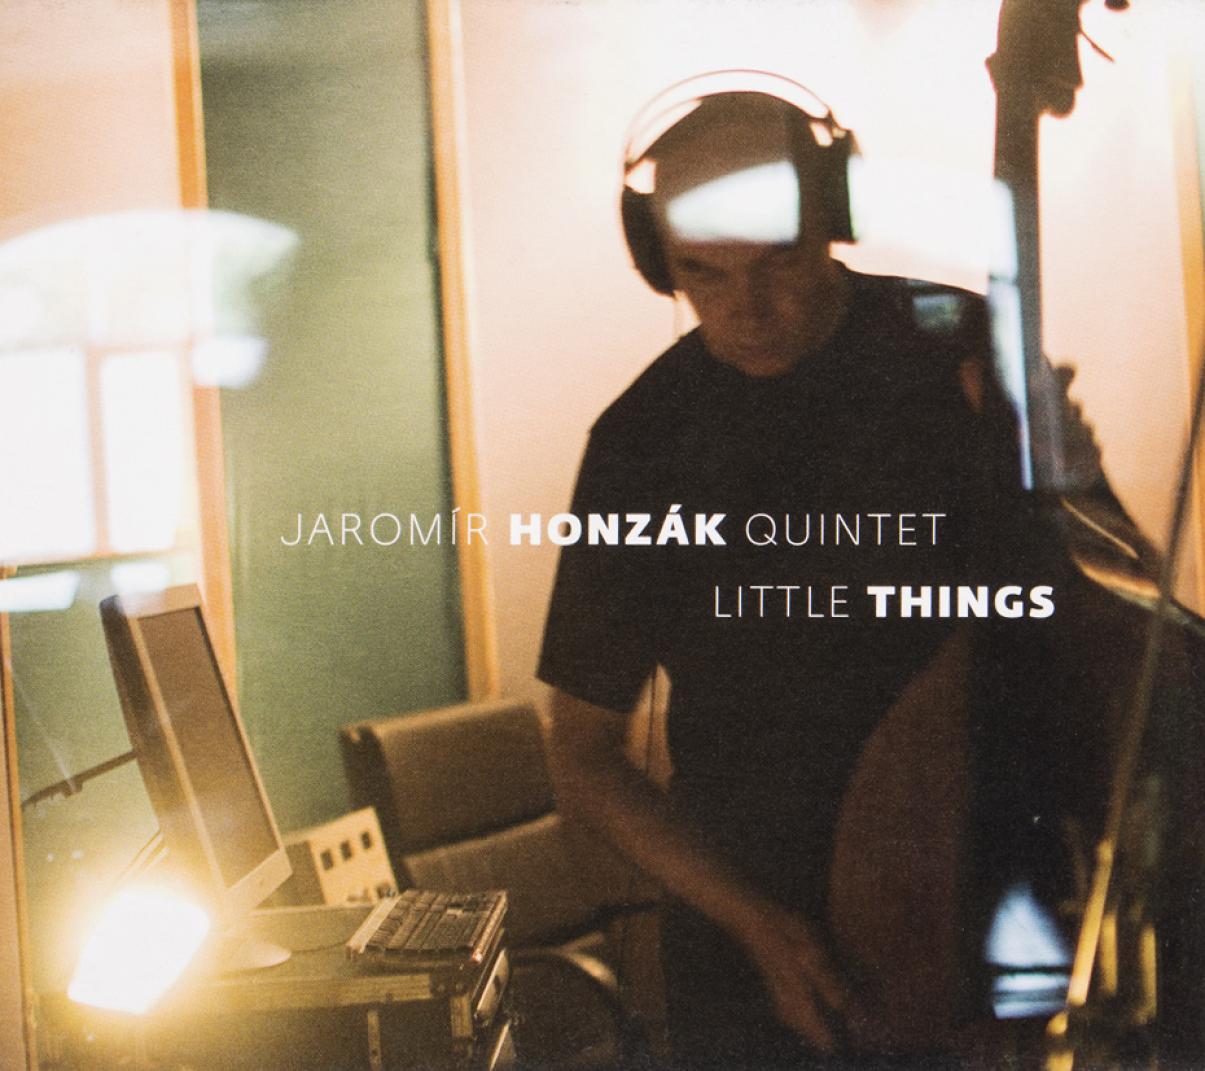 Jaromír Honzák Quintet: Little Things